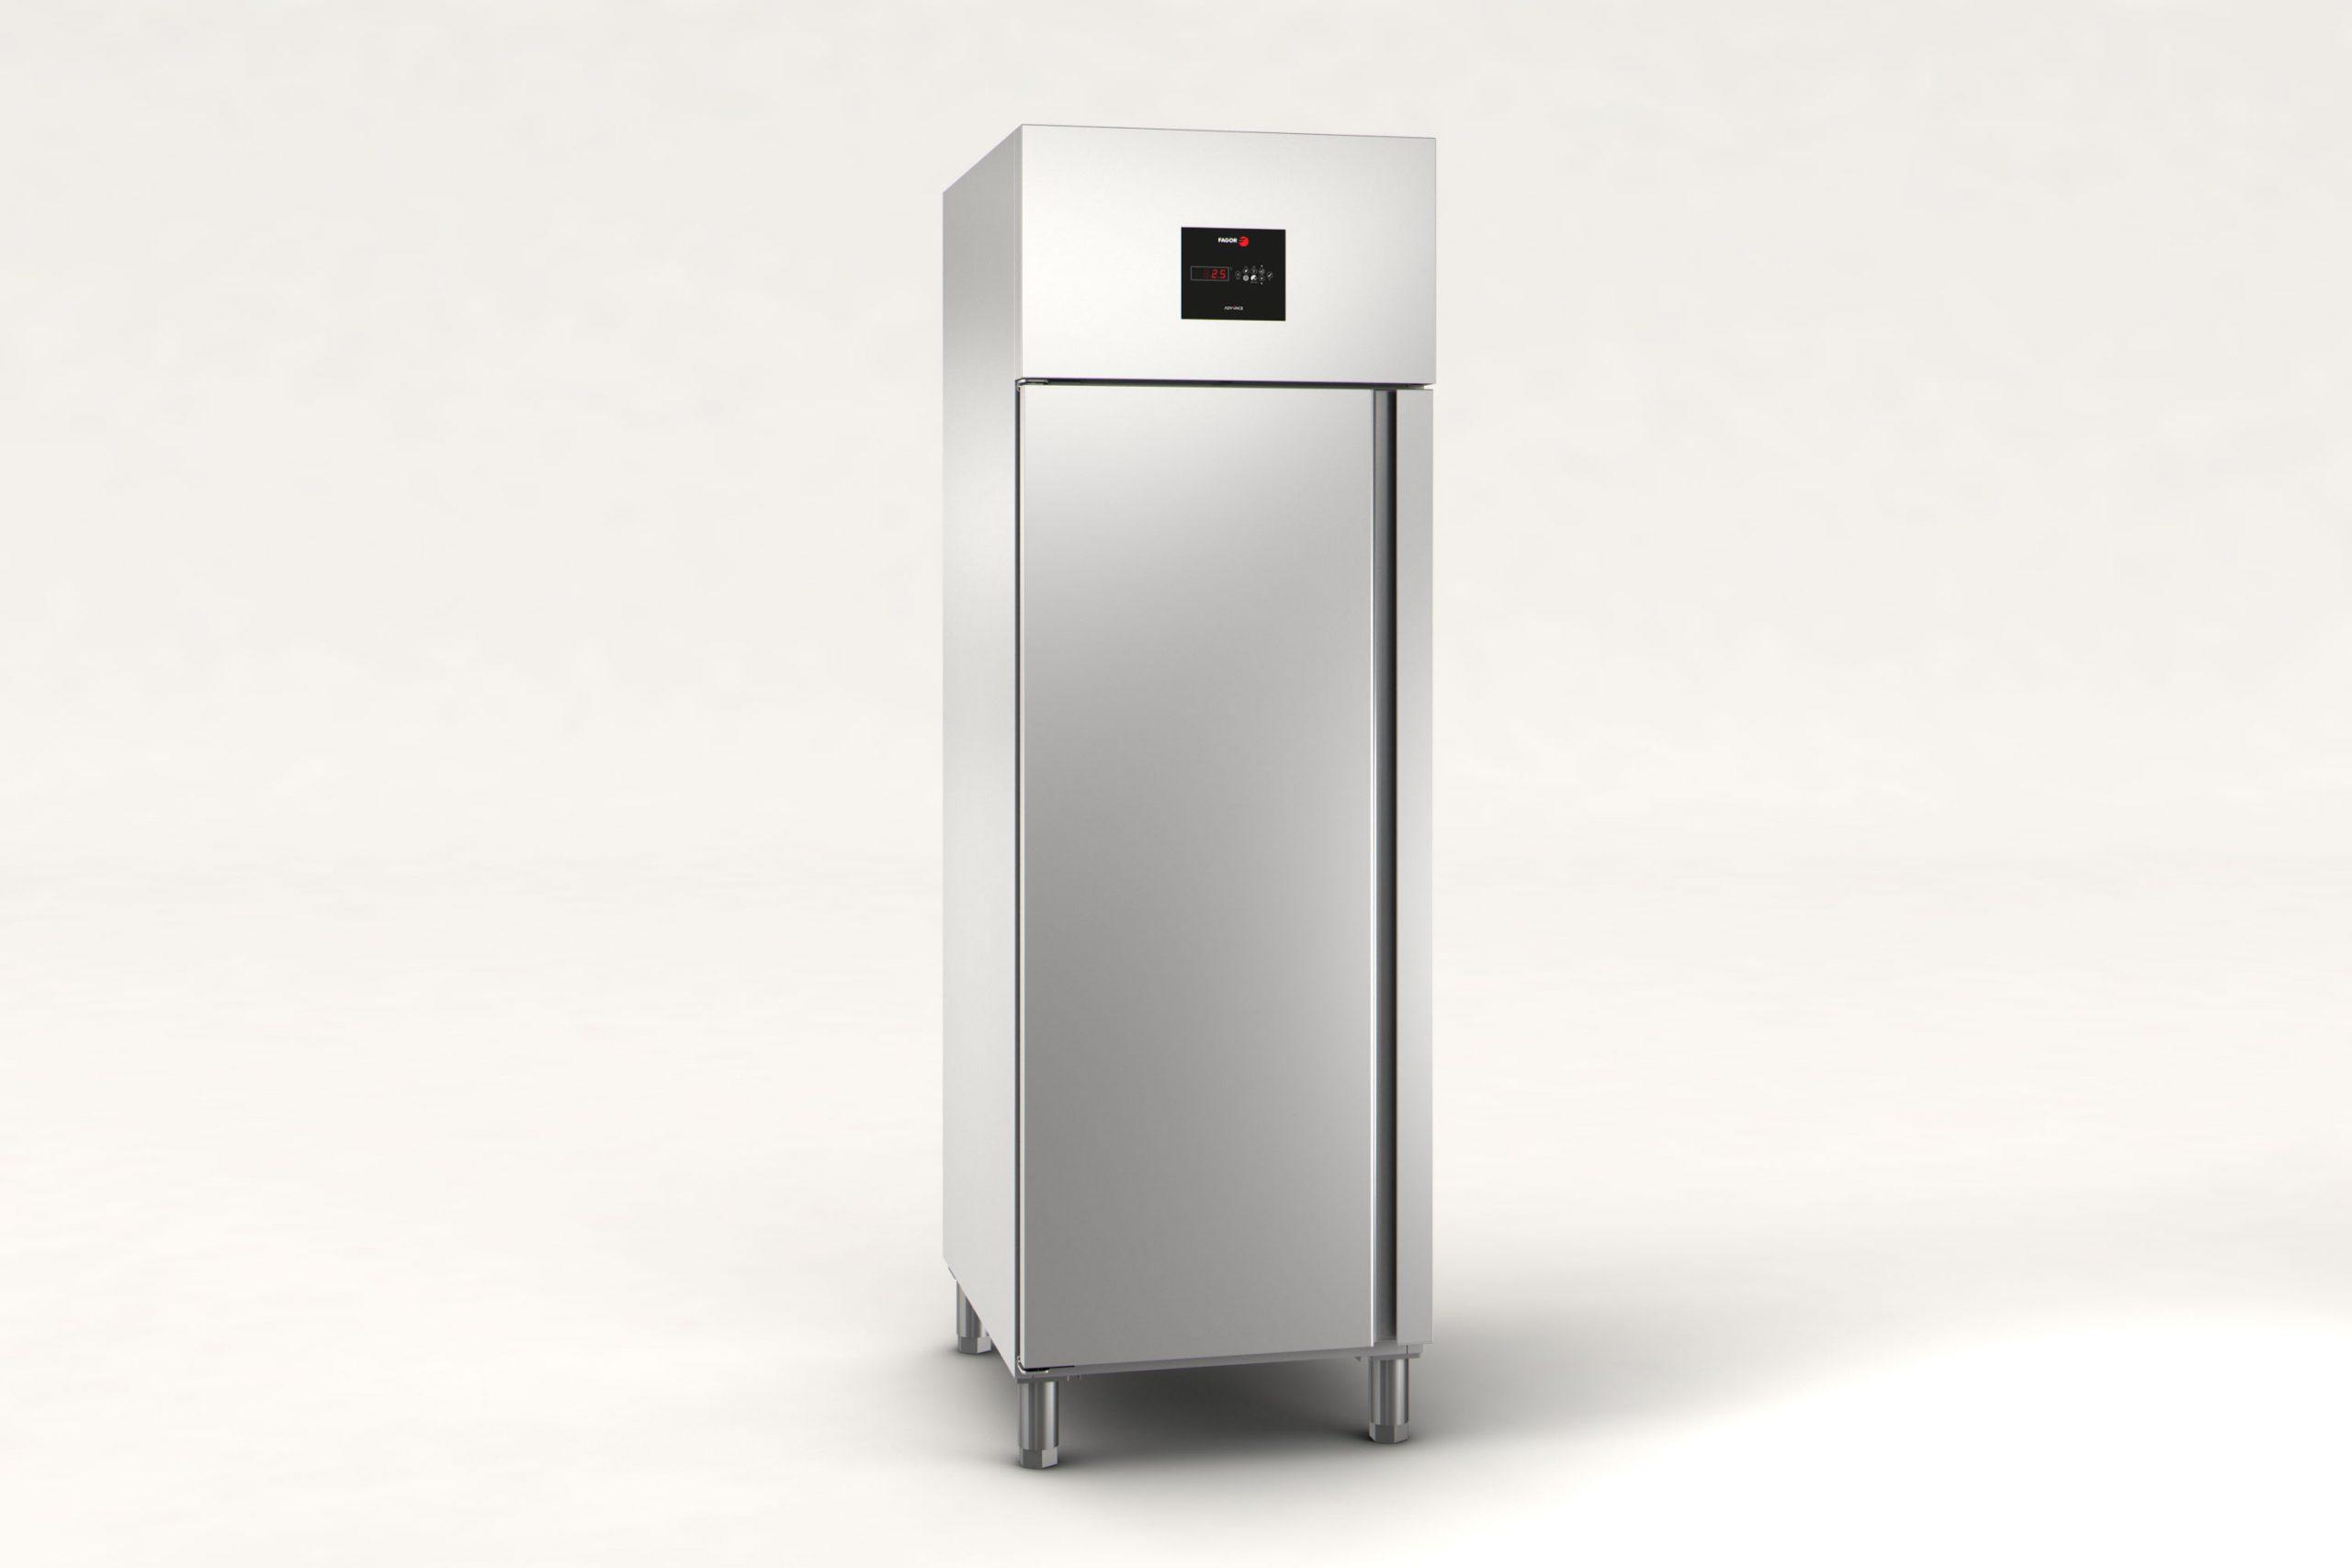 Модерните хладилни шкафове – перфектен избор за всяко заведение или магазин